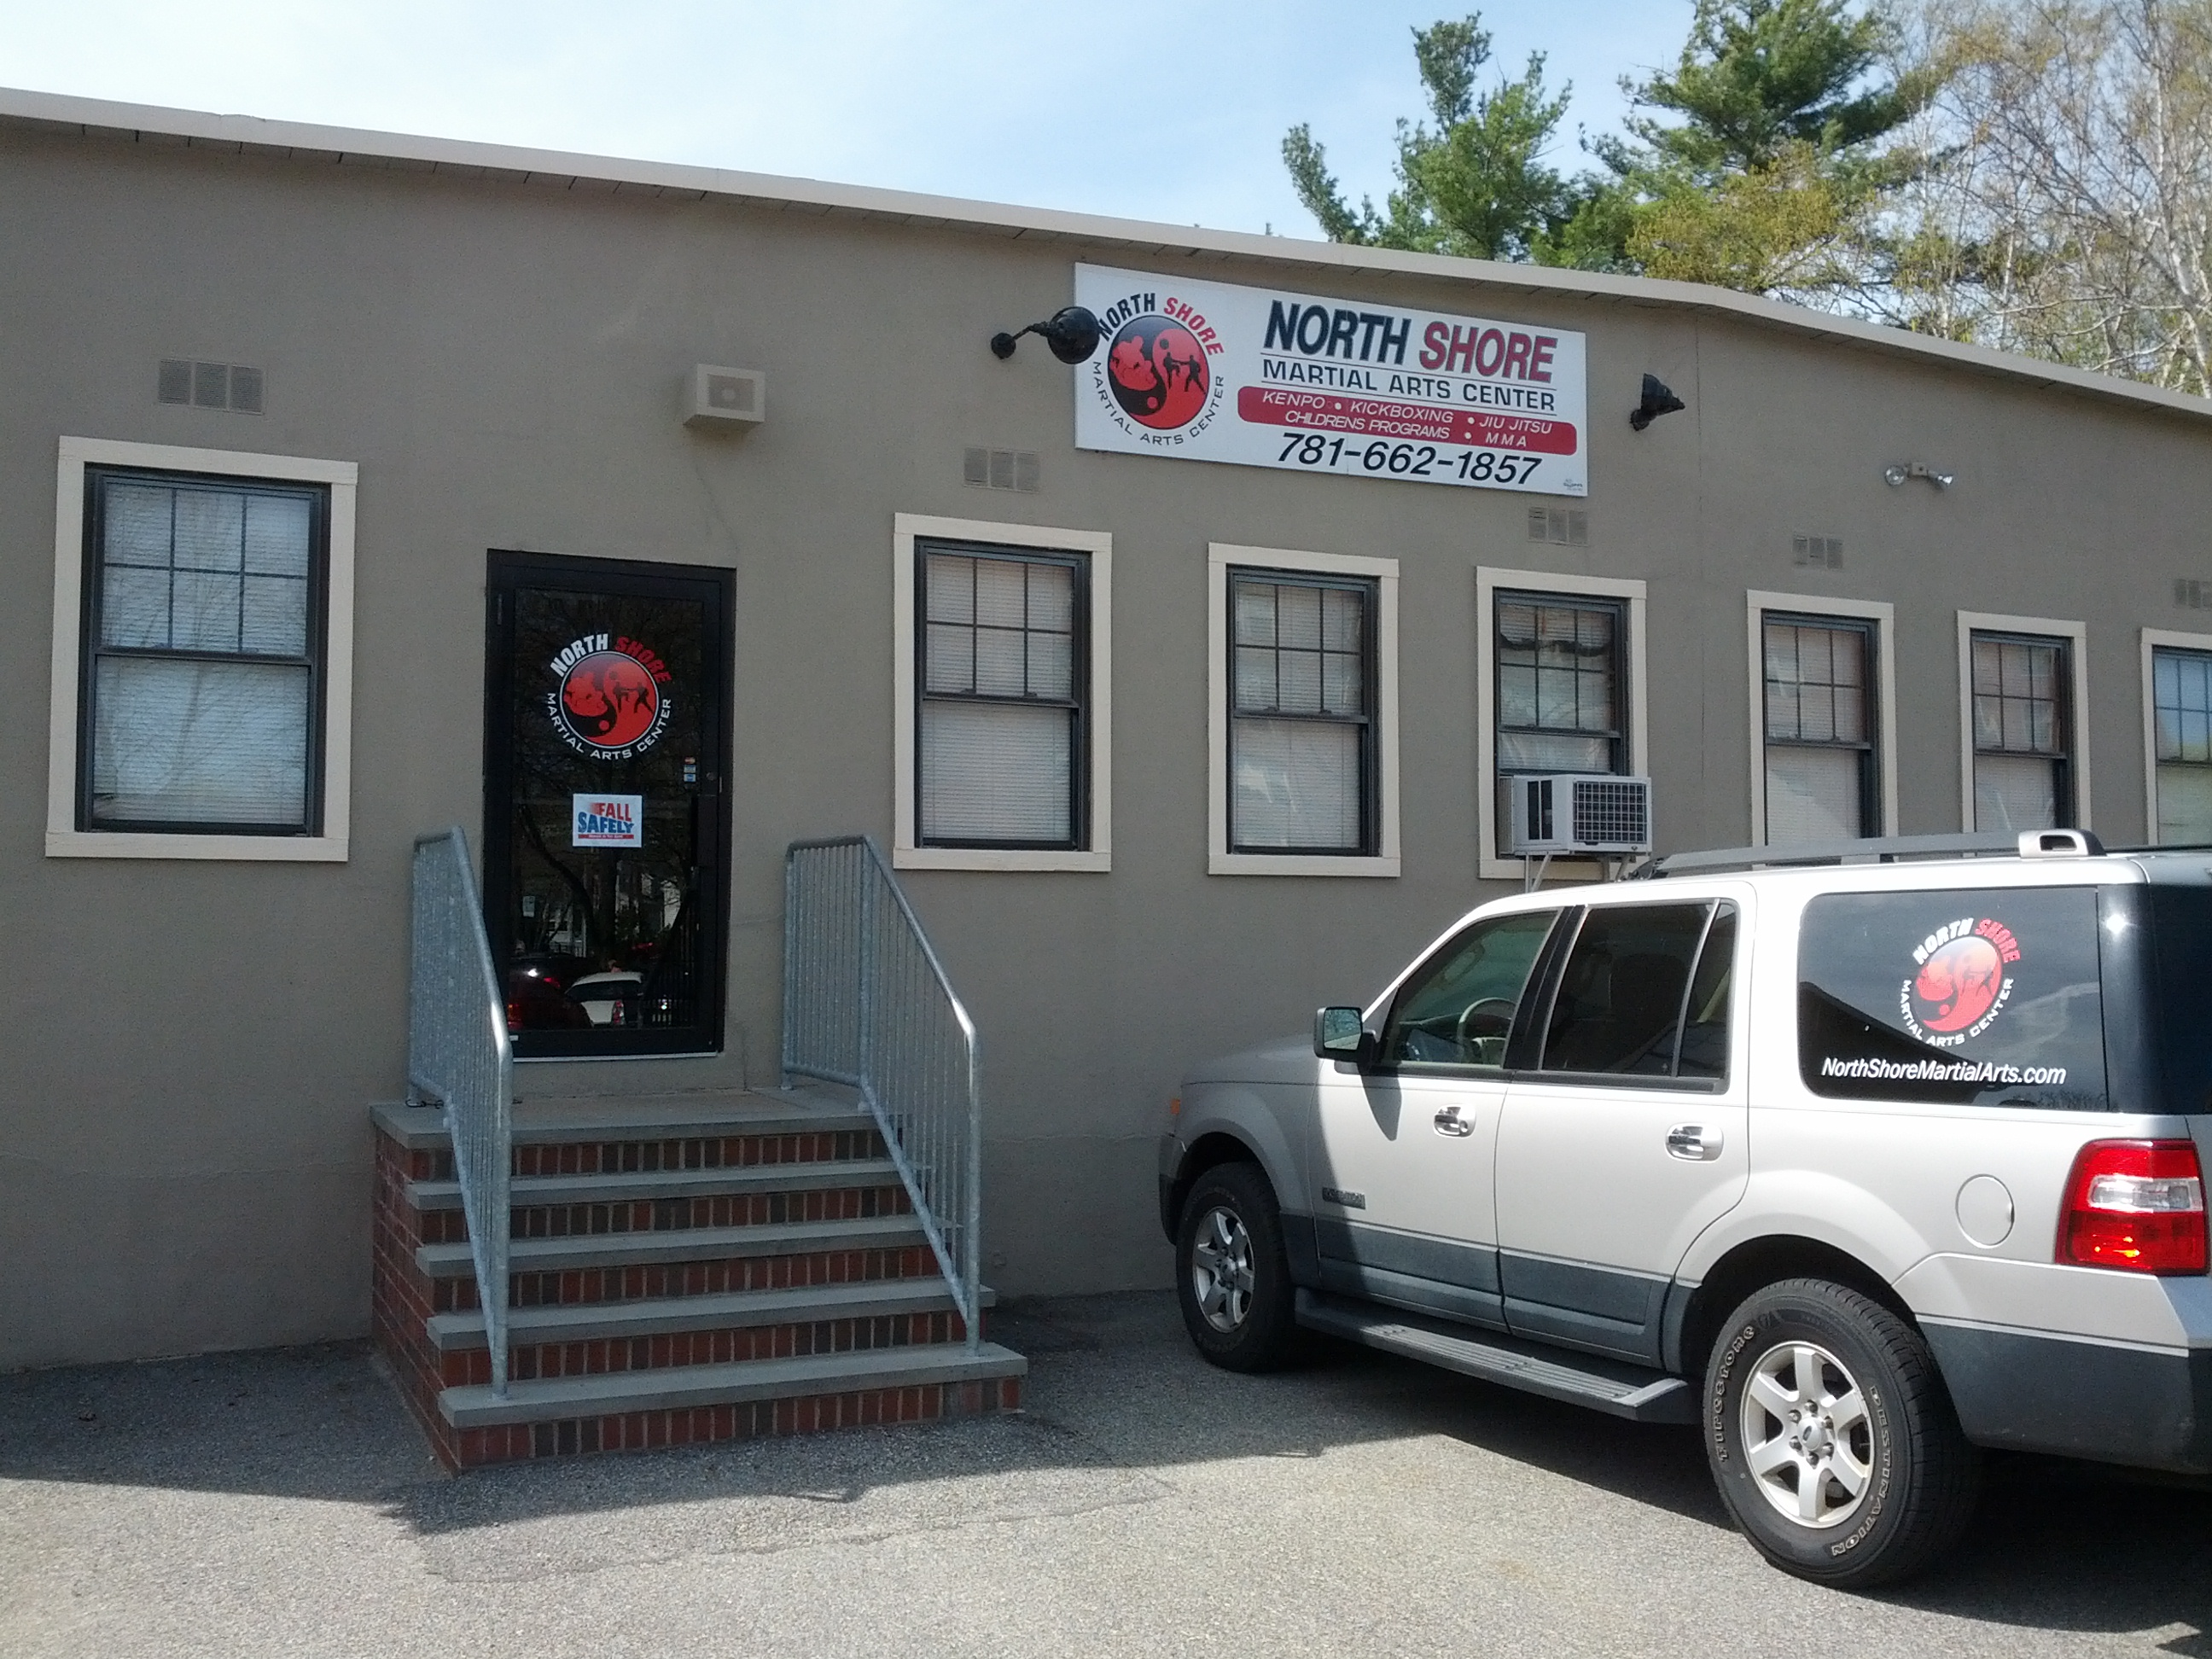 North Shore Martial Arts Center image 0